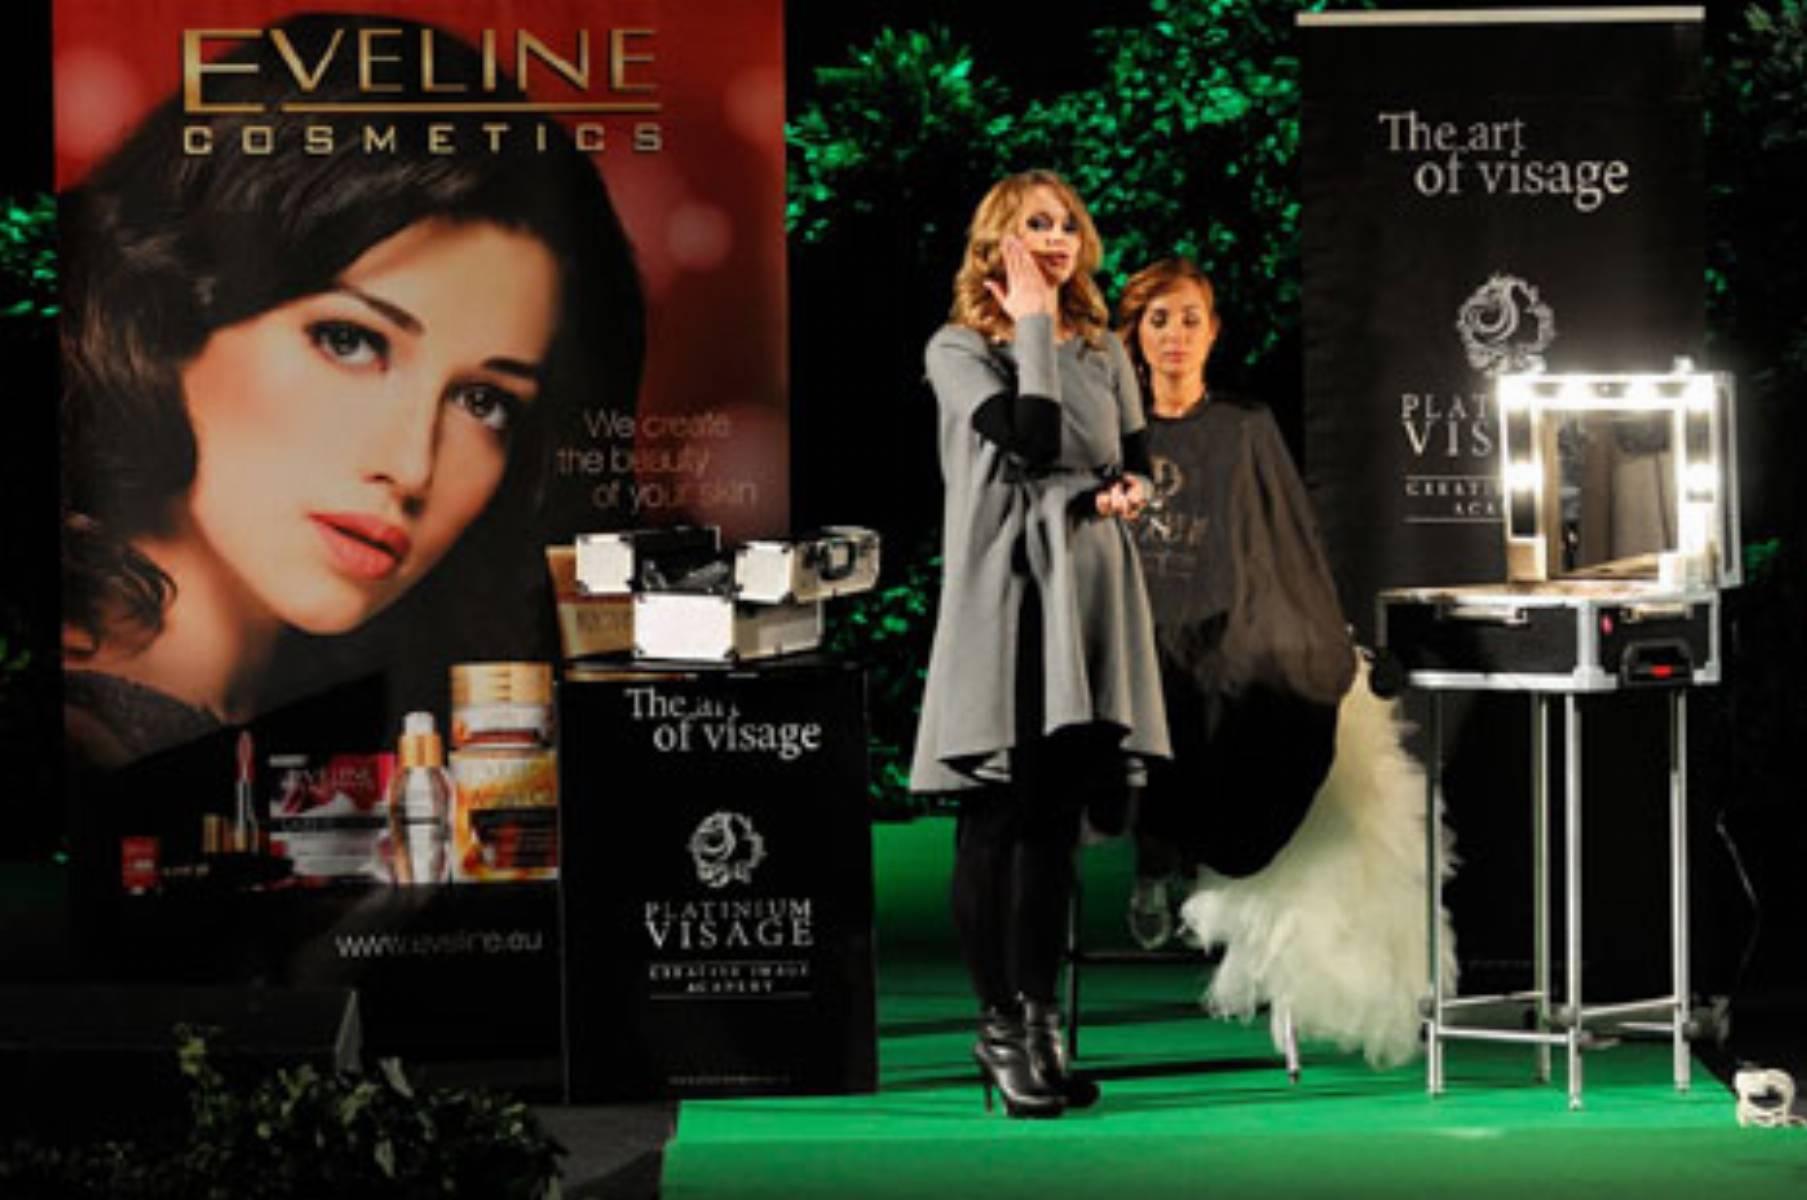 Eveline Cosmetics fot. Michal Maliszewski Polska Gala Slubna (2)